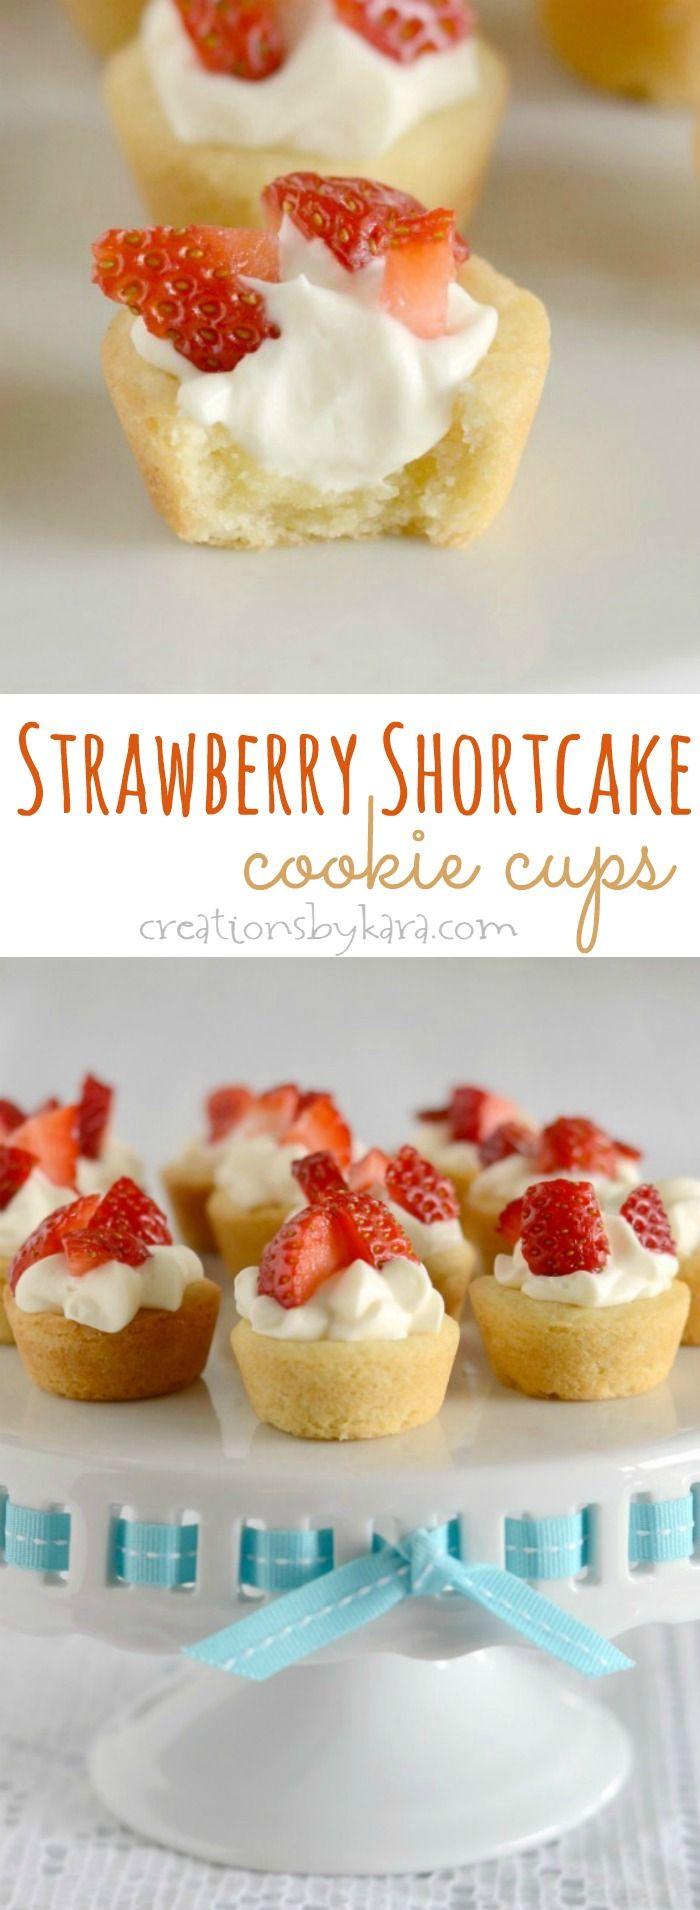 Mini Strawberry Shortcake Cups- a fun way to serve strawberry shortcake!